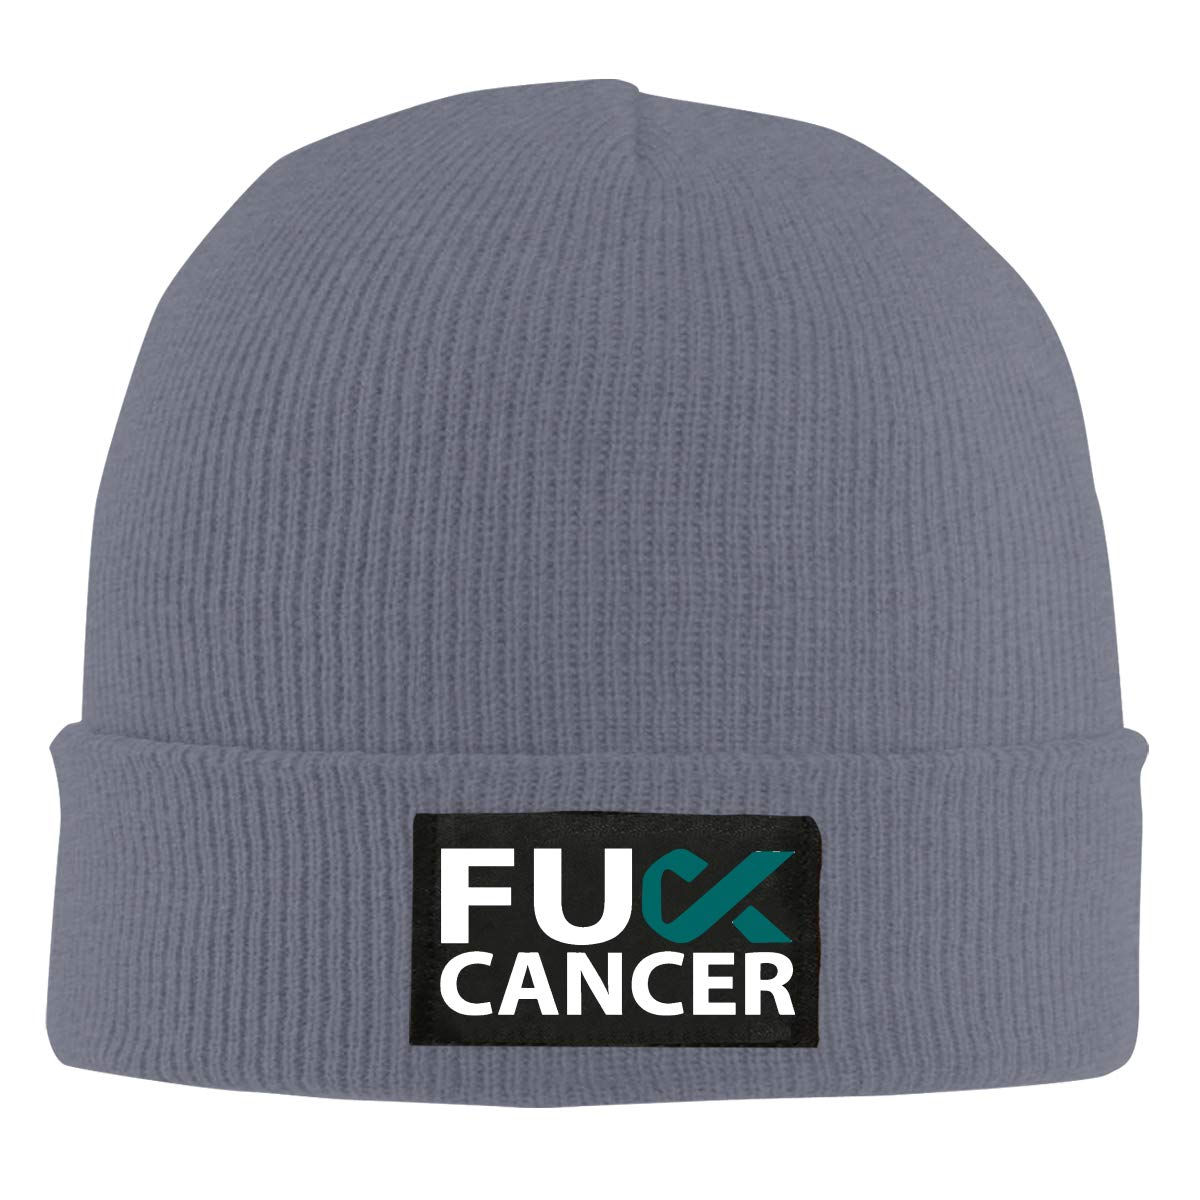 Fuck Ovarian Cancer Teal Ribbon Unisex Warm Winter Hat Knit Beanie Skull Cap Cuff Beanie Hat Winter Hats